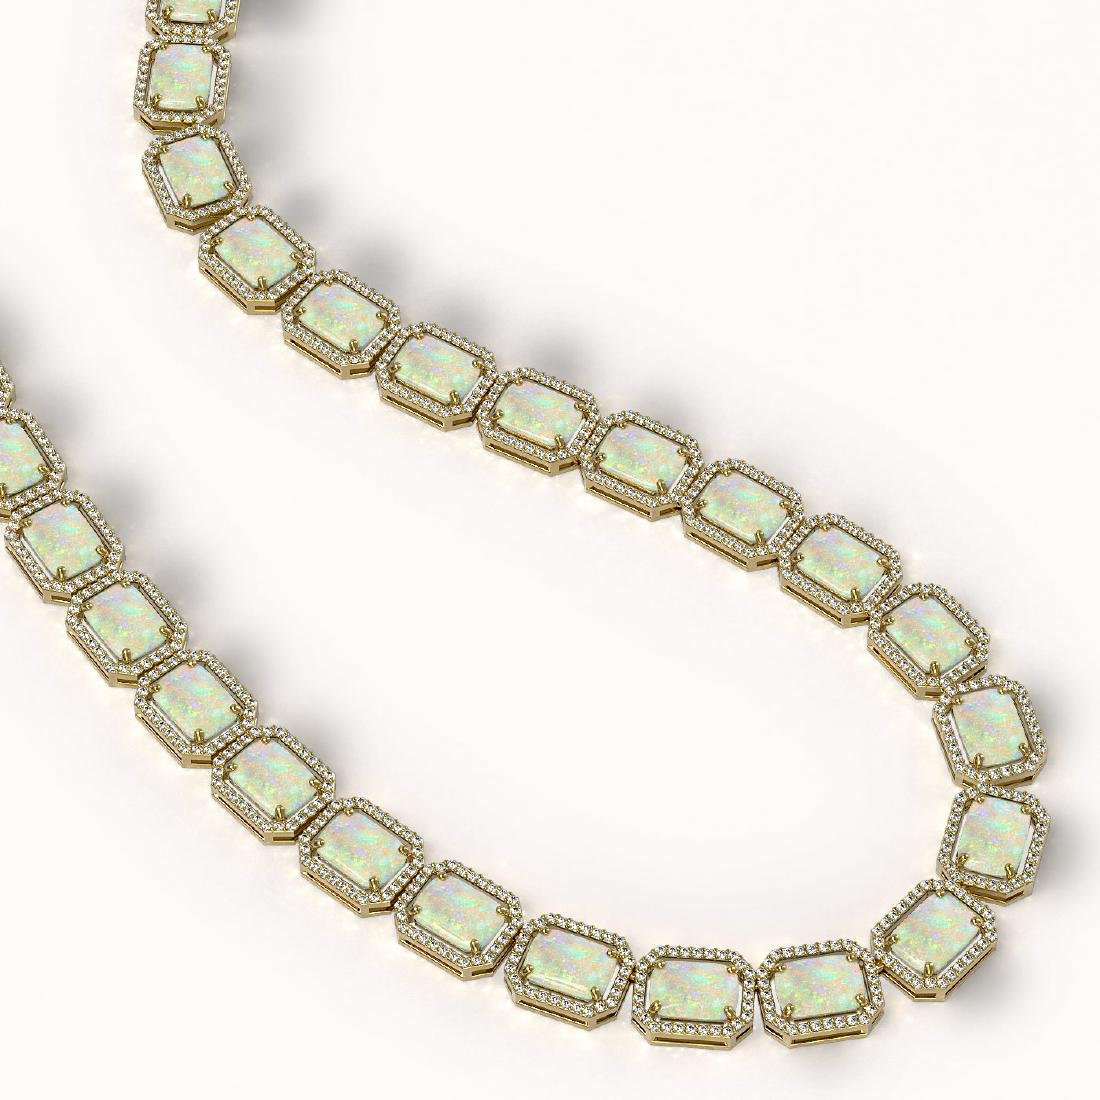 53.59 CTW Opal & Diamond Halo Necklace 10K Yellow Gold - 2